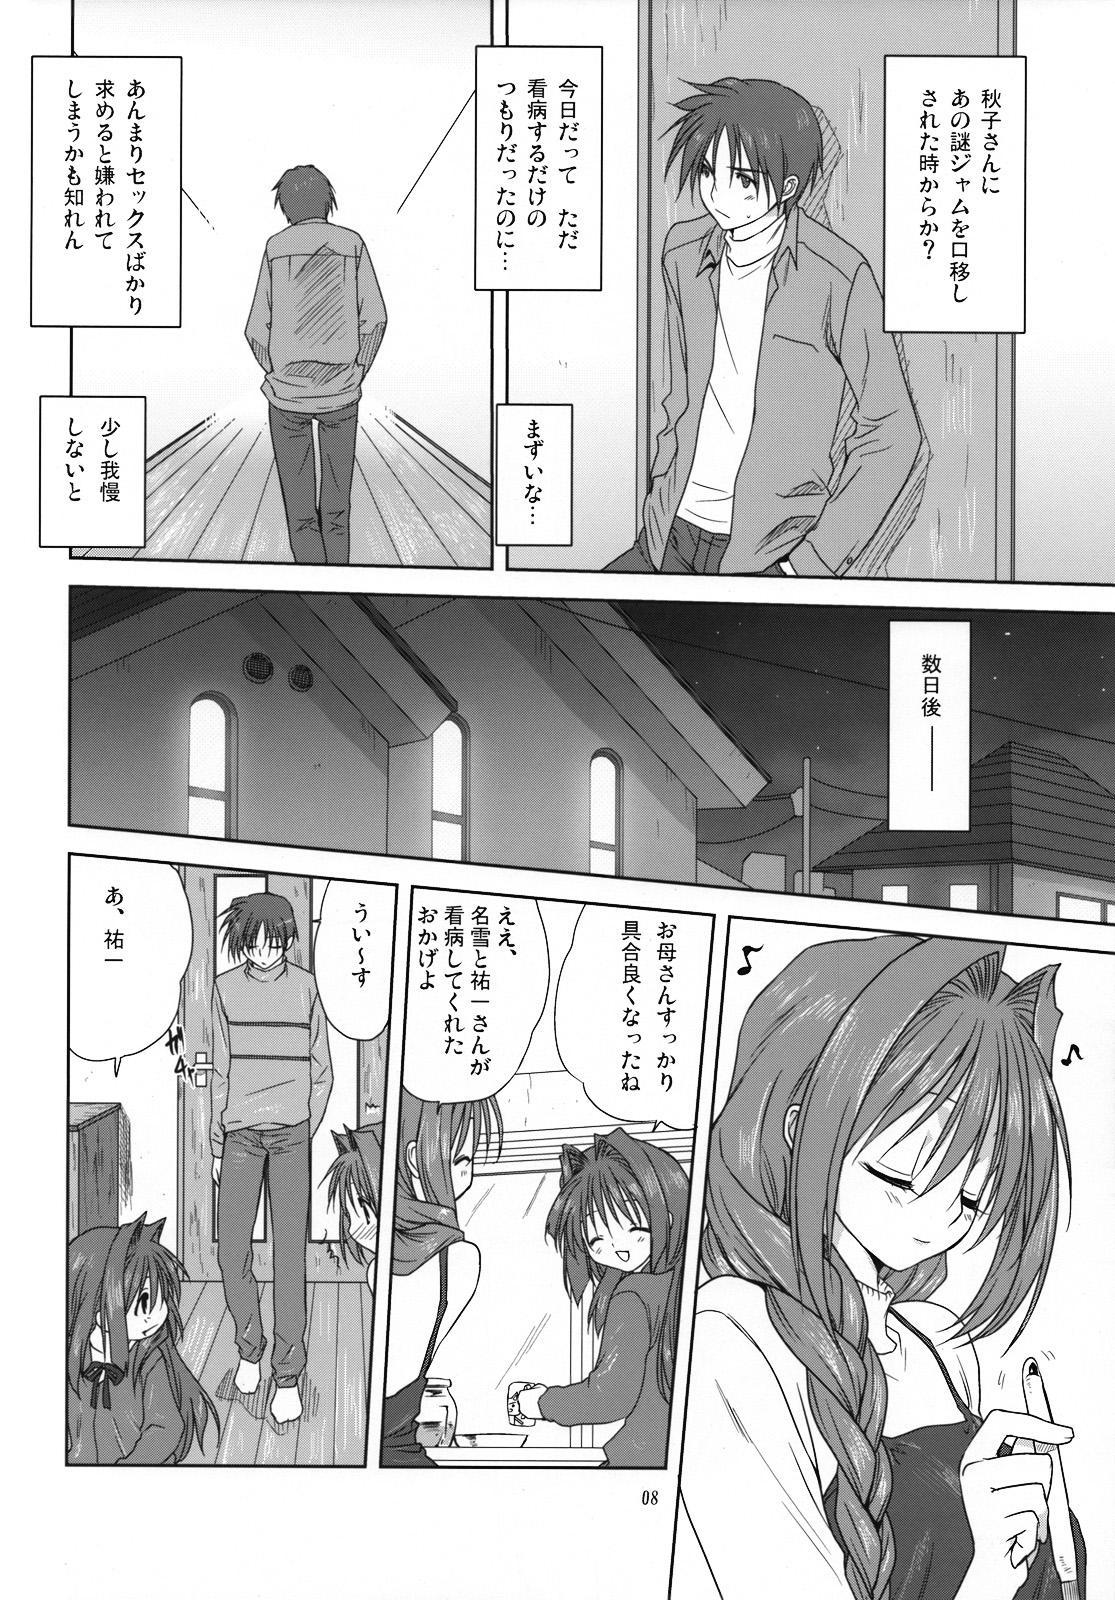 Akiko-san to Issho 3 6